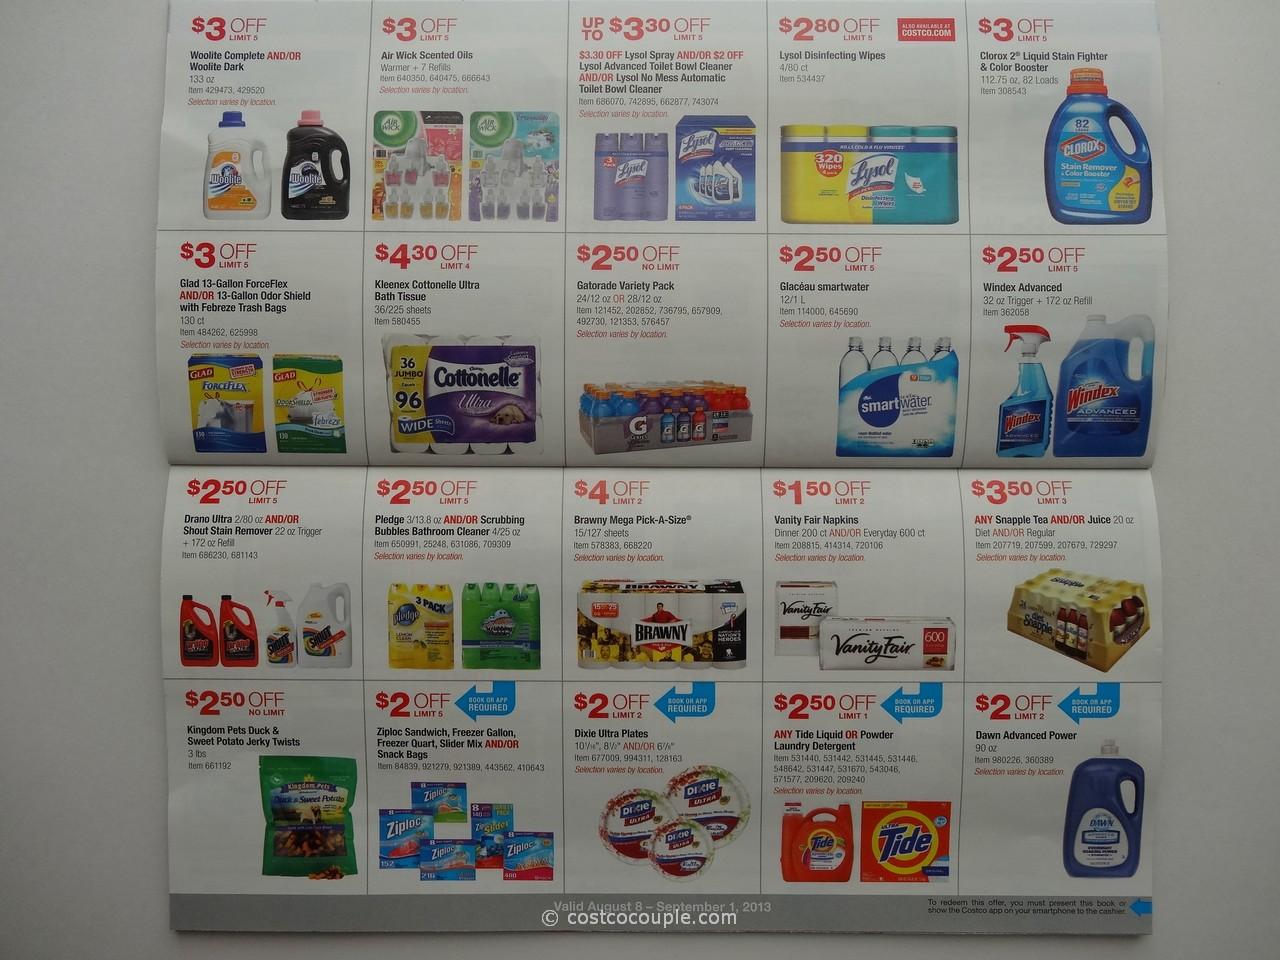 ... Codes 2015 Shopathomecom. Living Social Coupon Codes August 2013. View